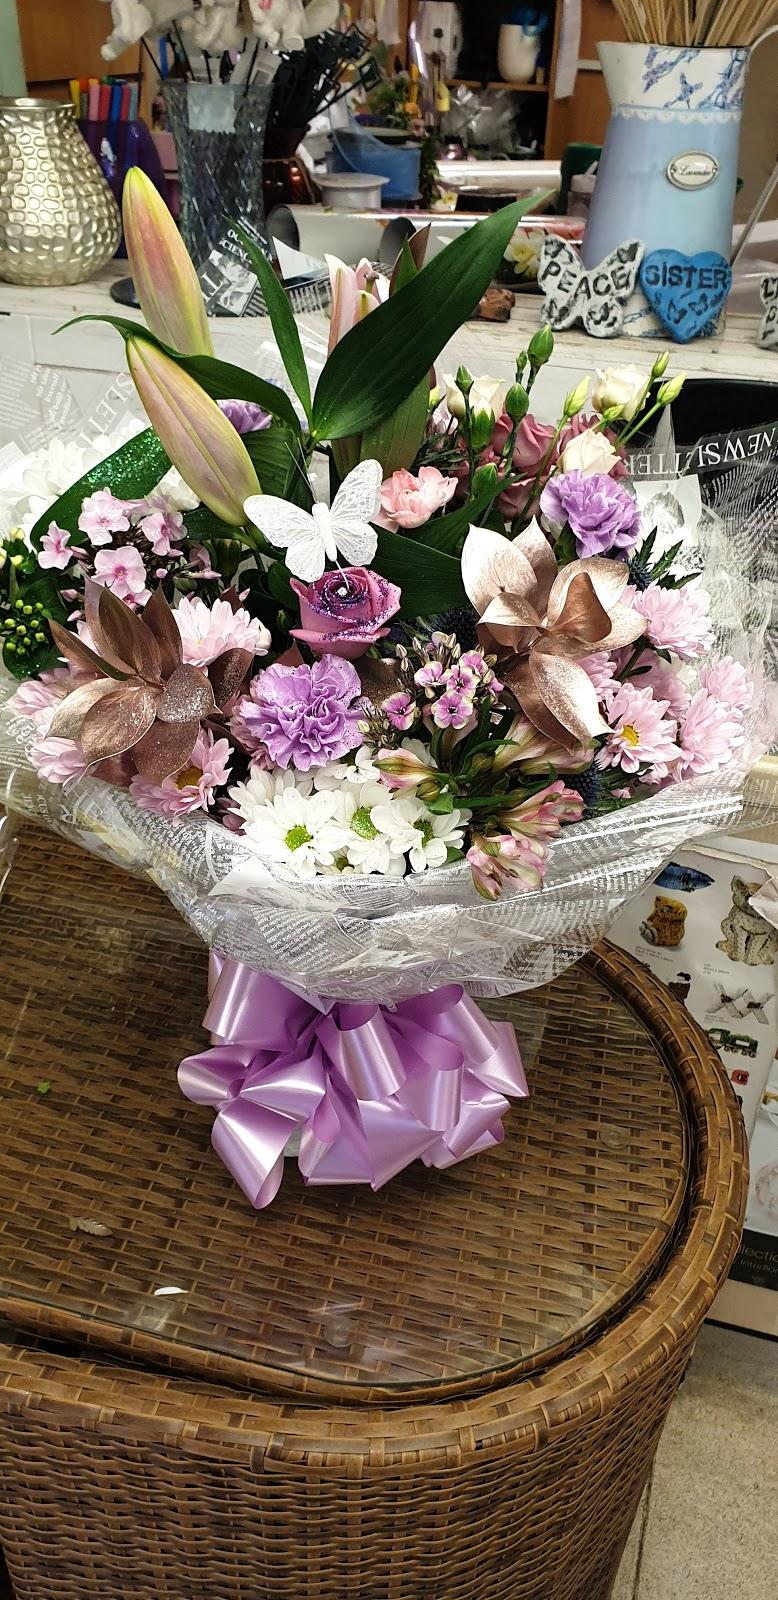 Robinsons Florist (inc Sarahs)